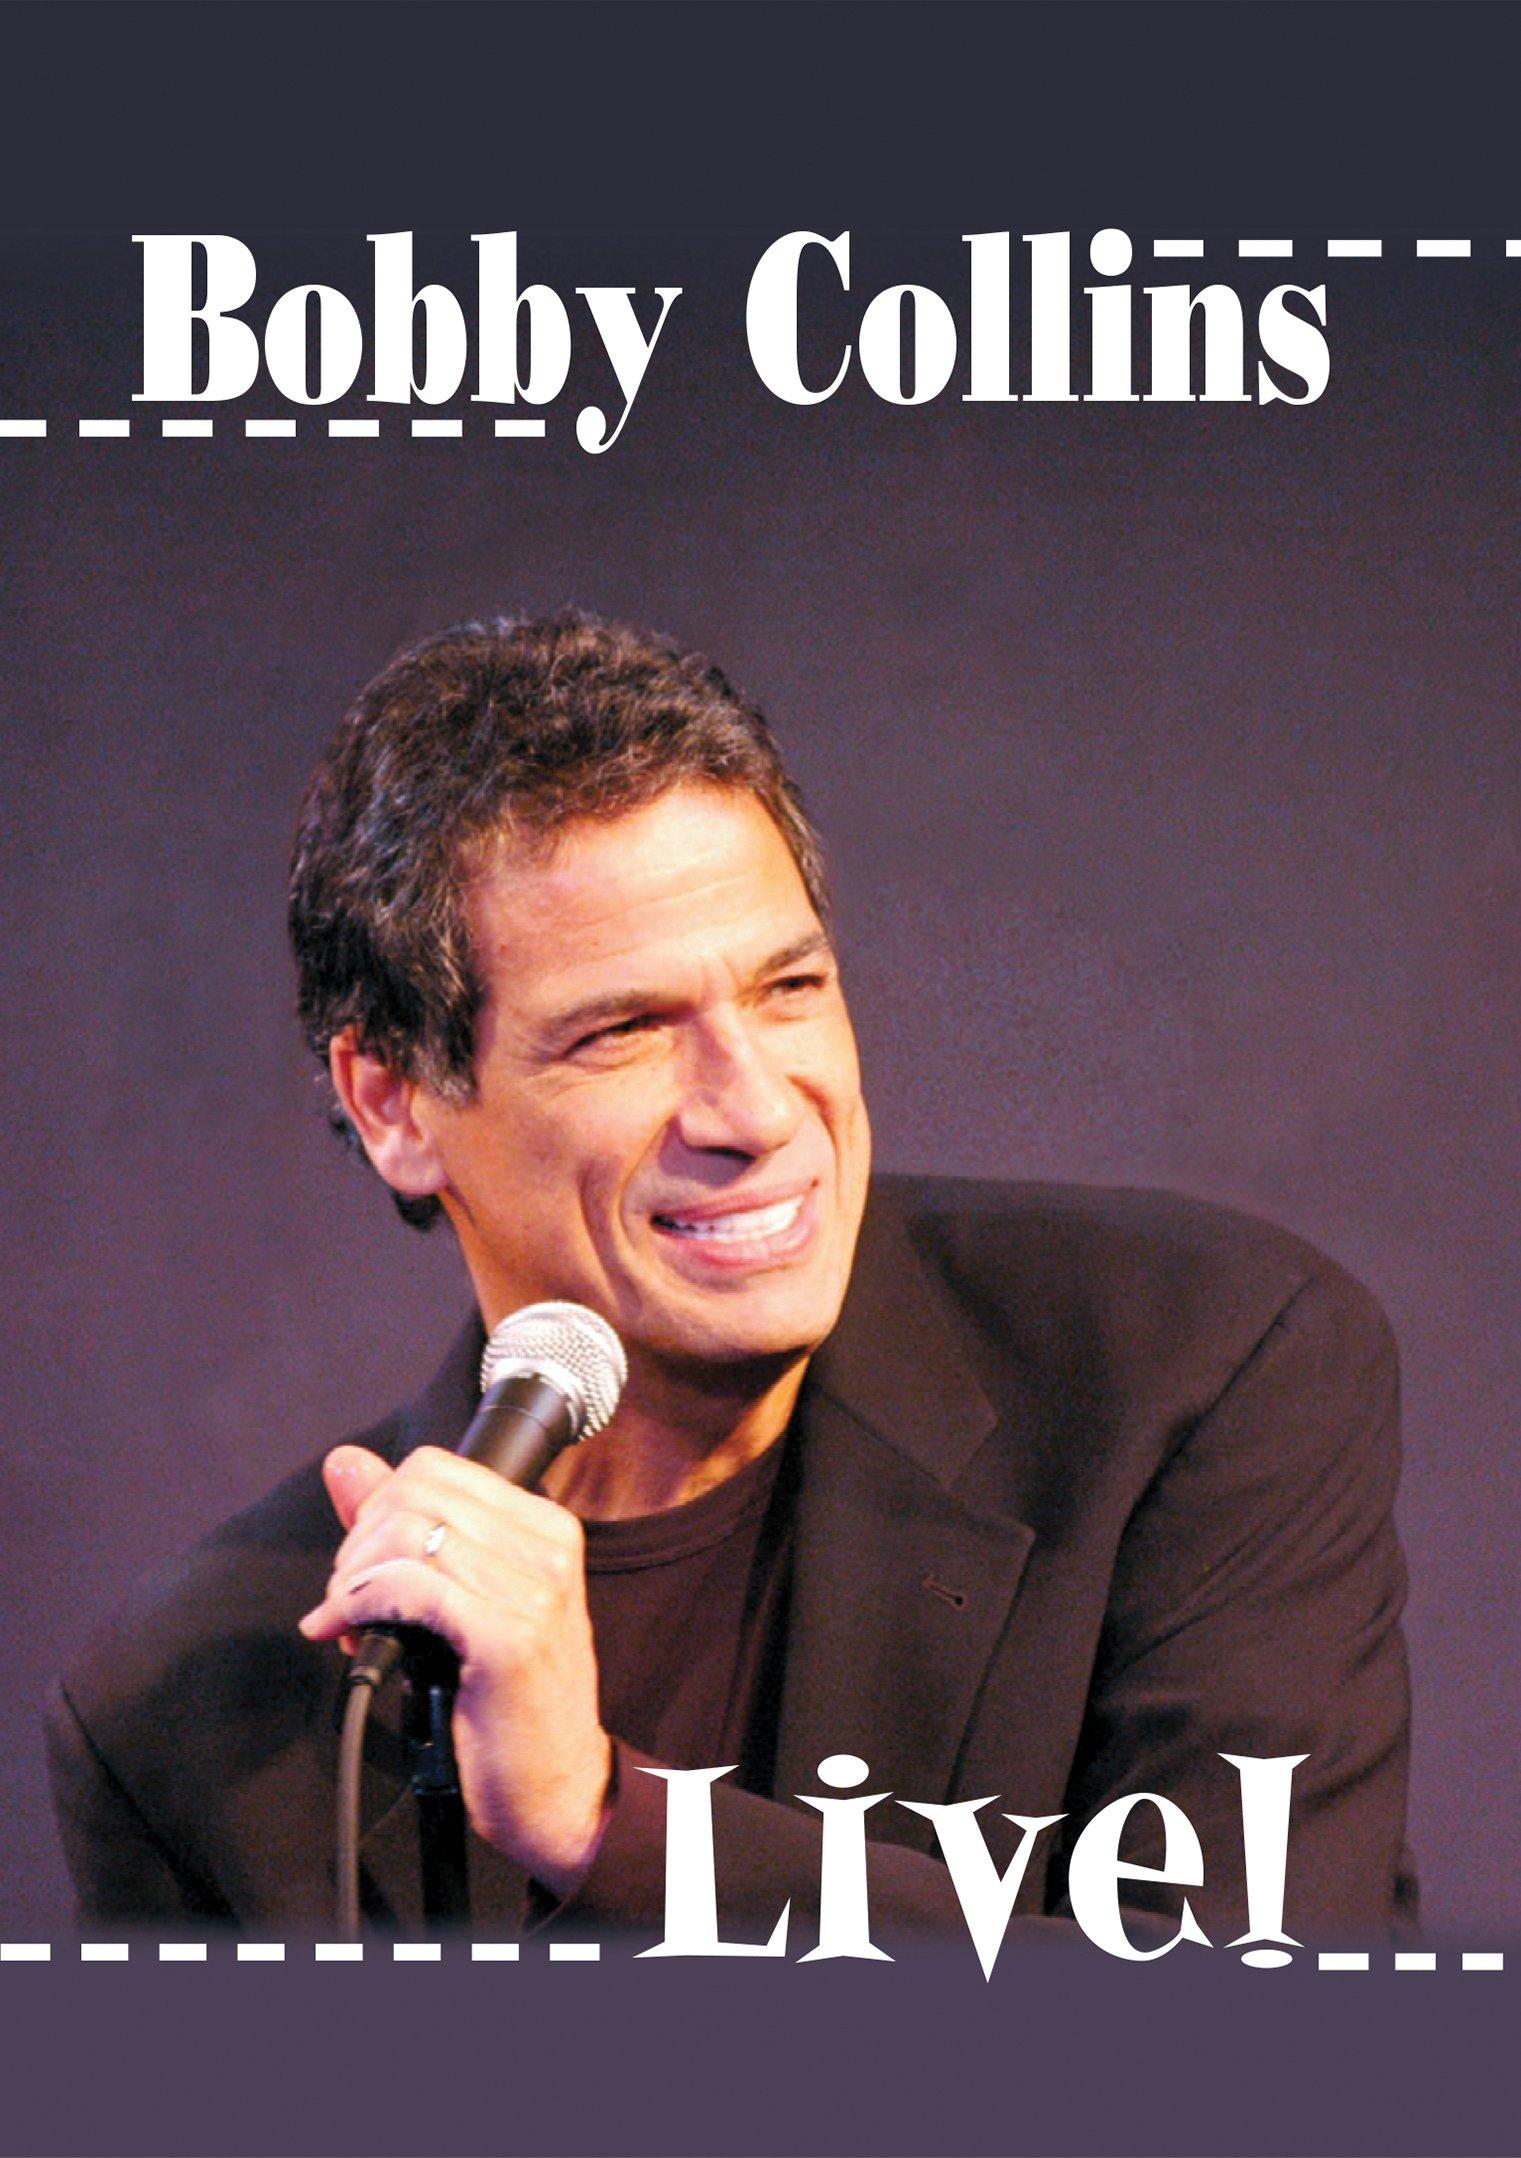 Bobby Collins Live! by Uproar